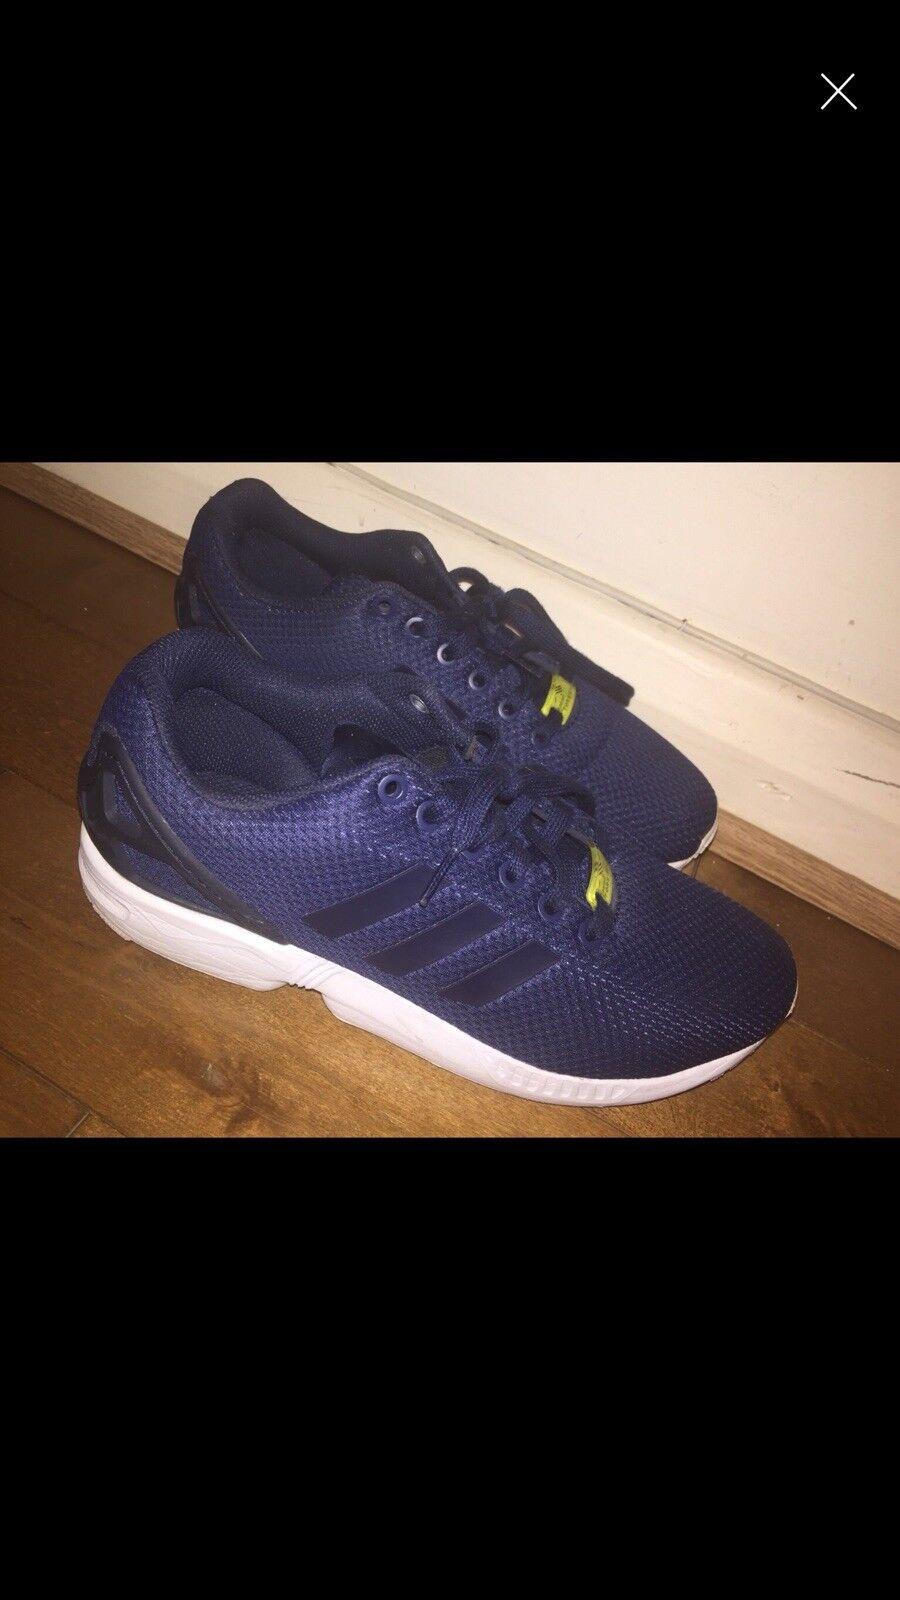 Adidas torsiin ZX flux bluee womens size 7.5